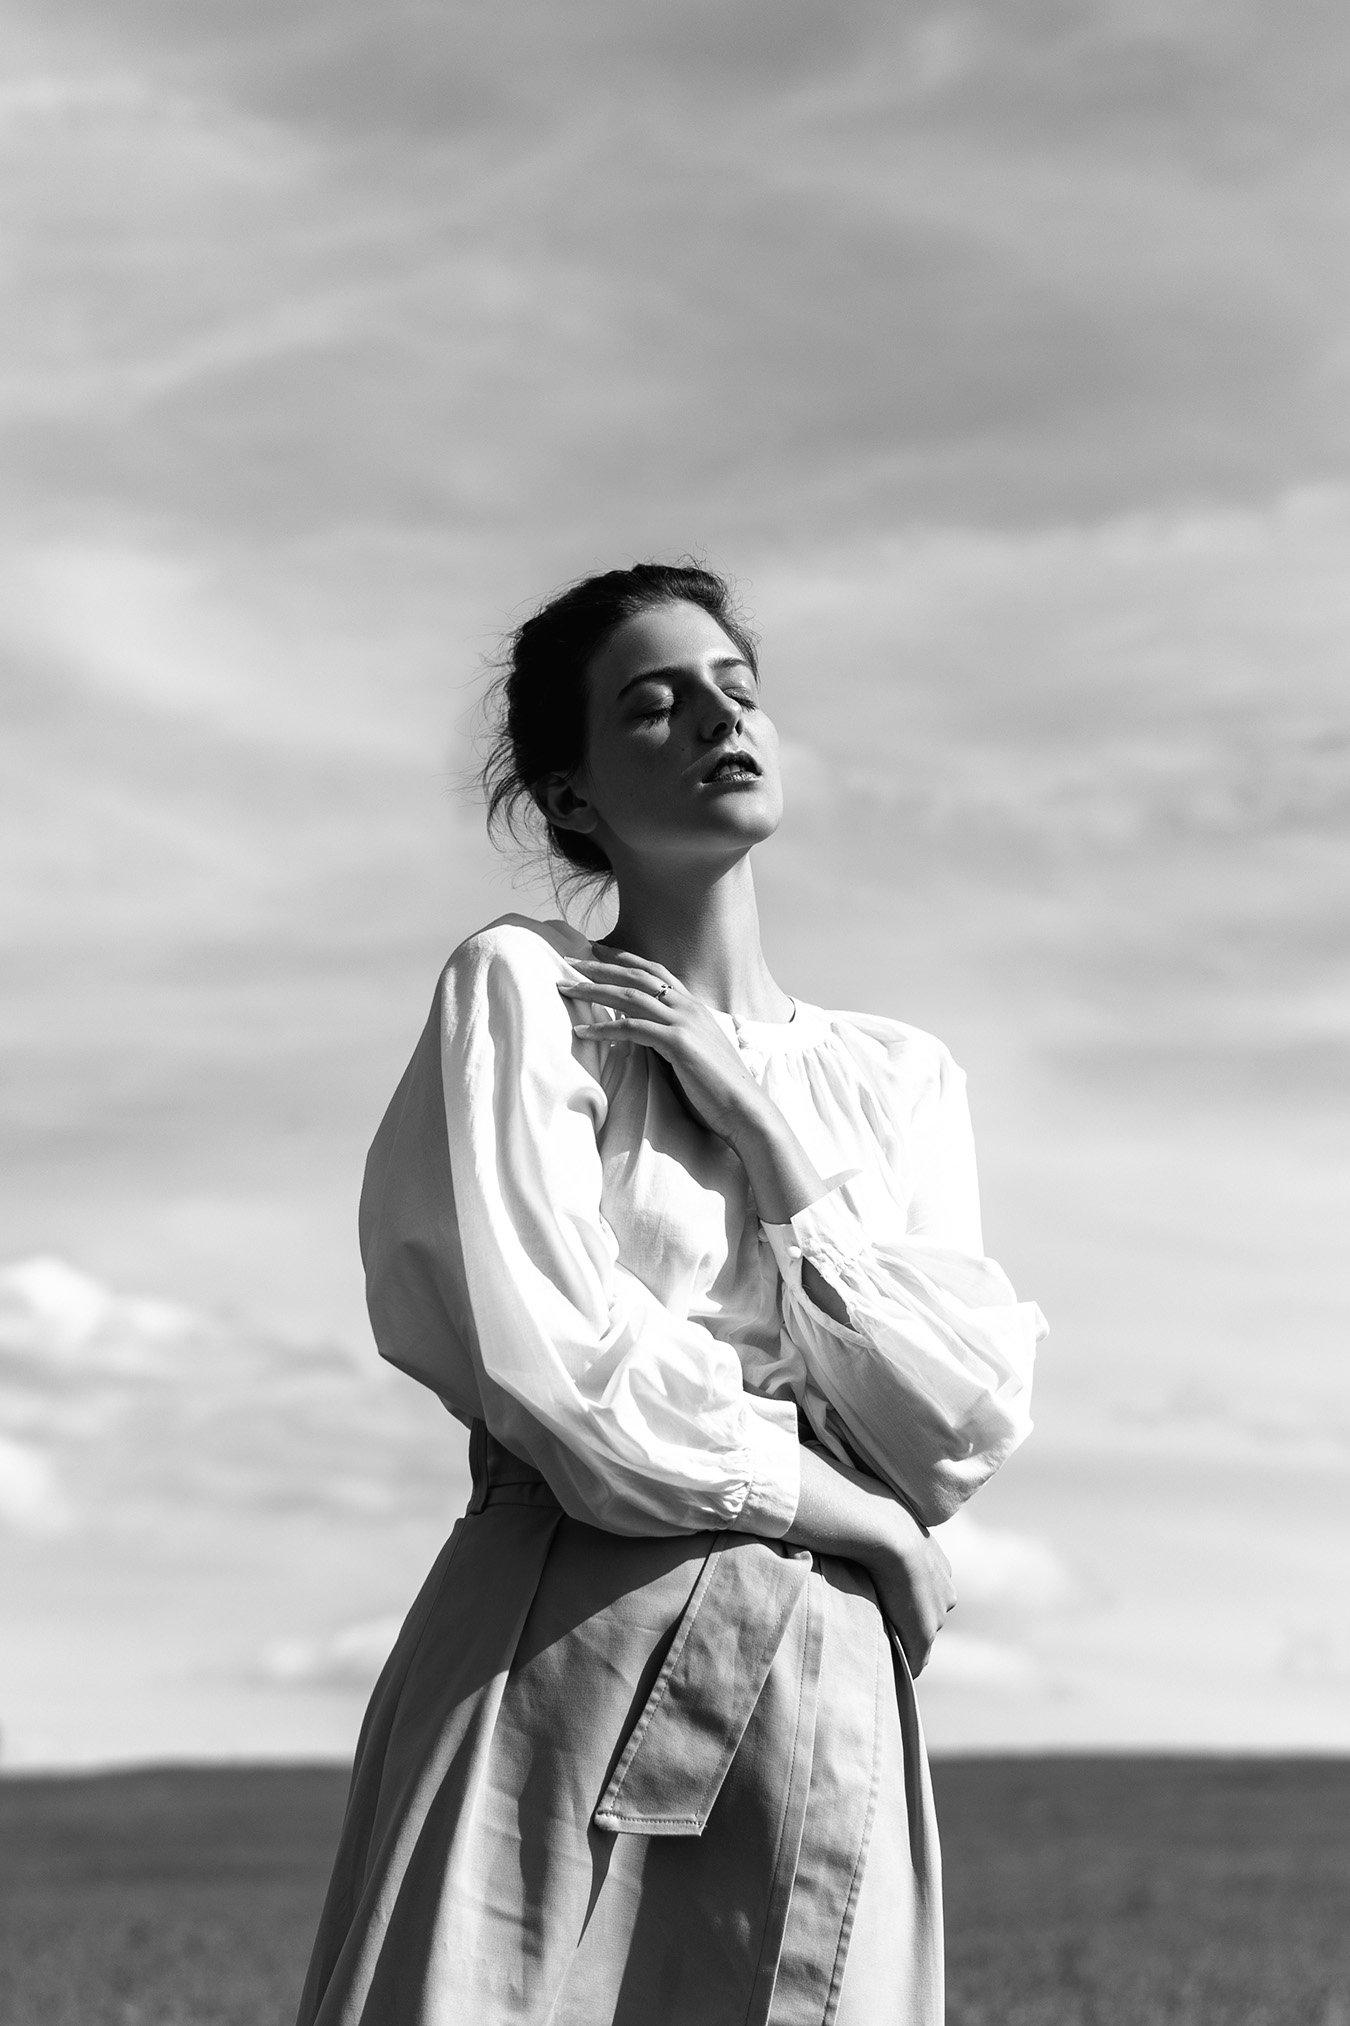 portrait женский портрет woman bnw black and white, Костюченков Дмитрий